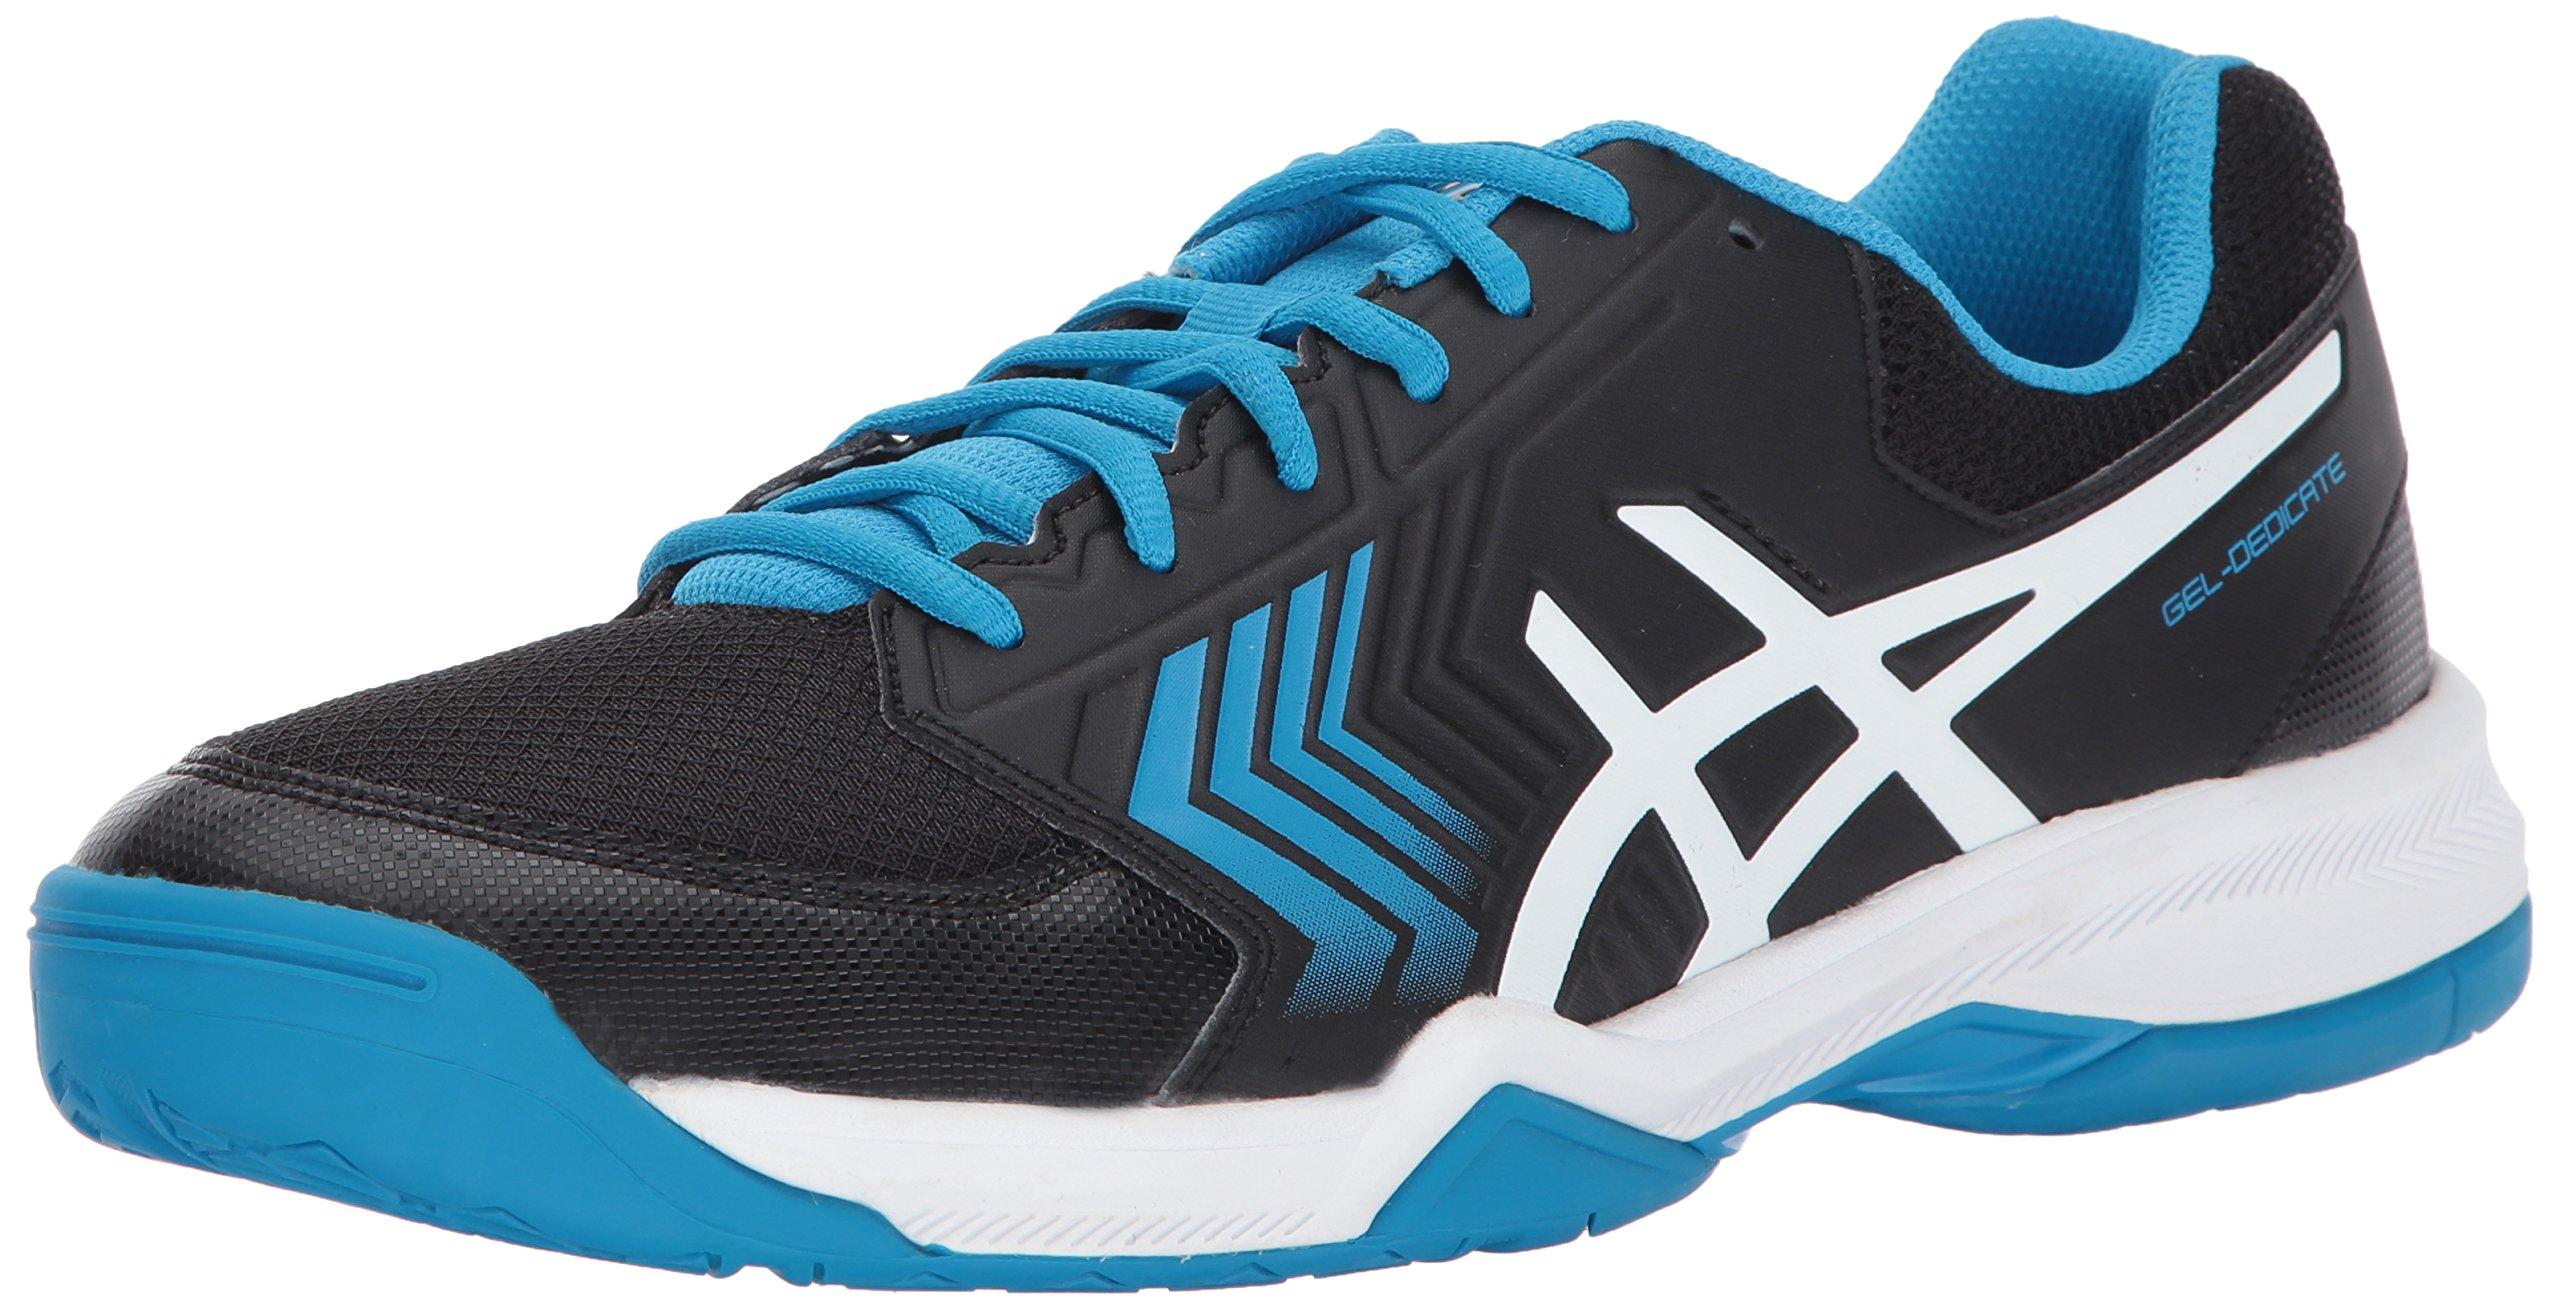 ASICS Mens Gel-Dedicate 5 Tennis Shoe Black/Hawaiian Surf/White 6 Medium US